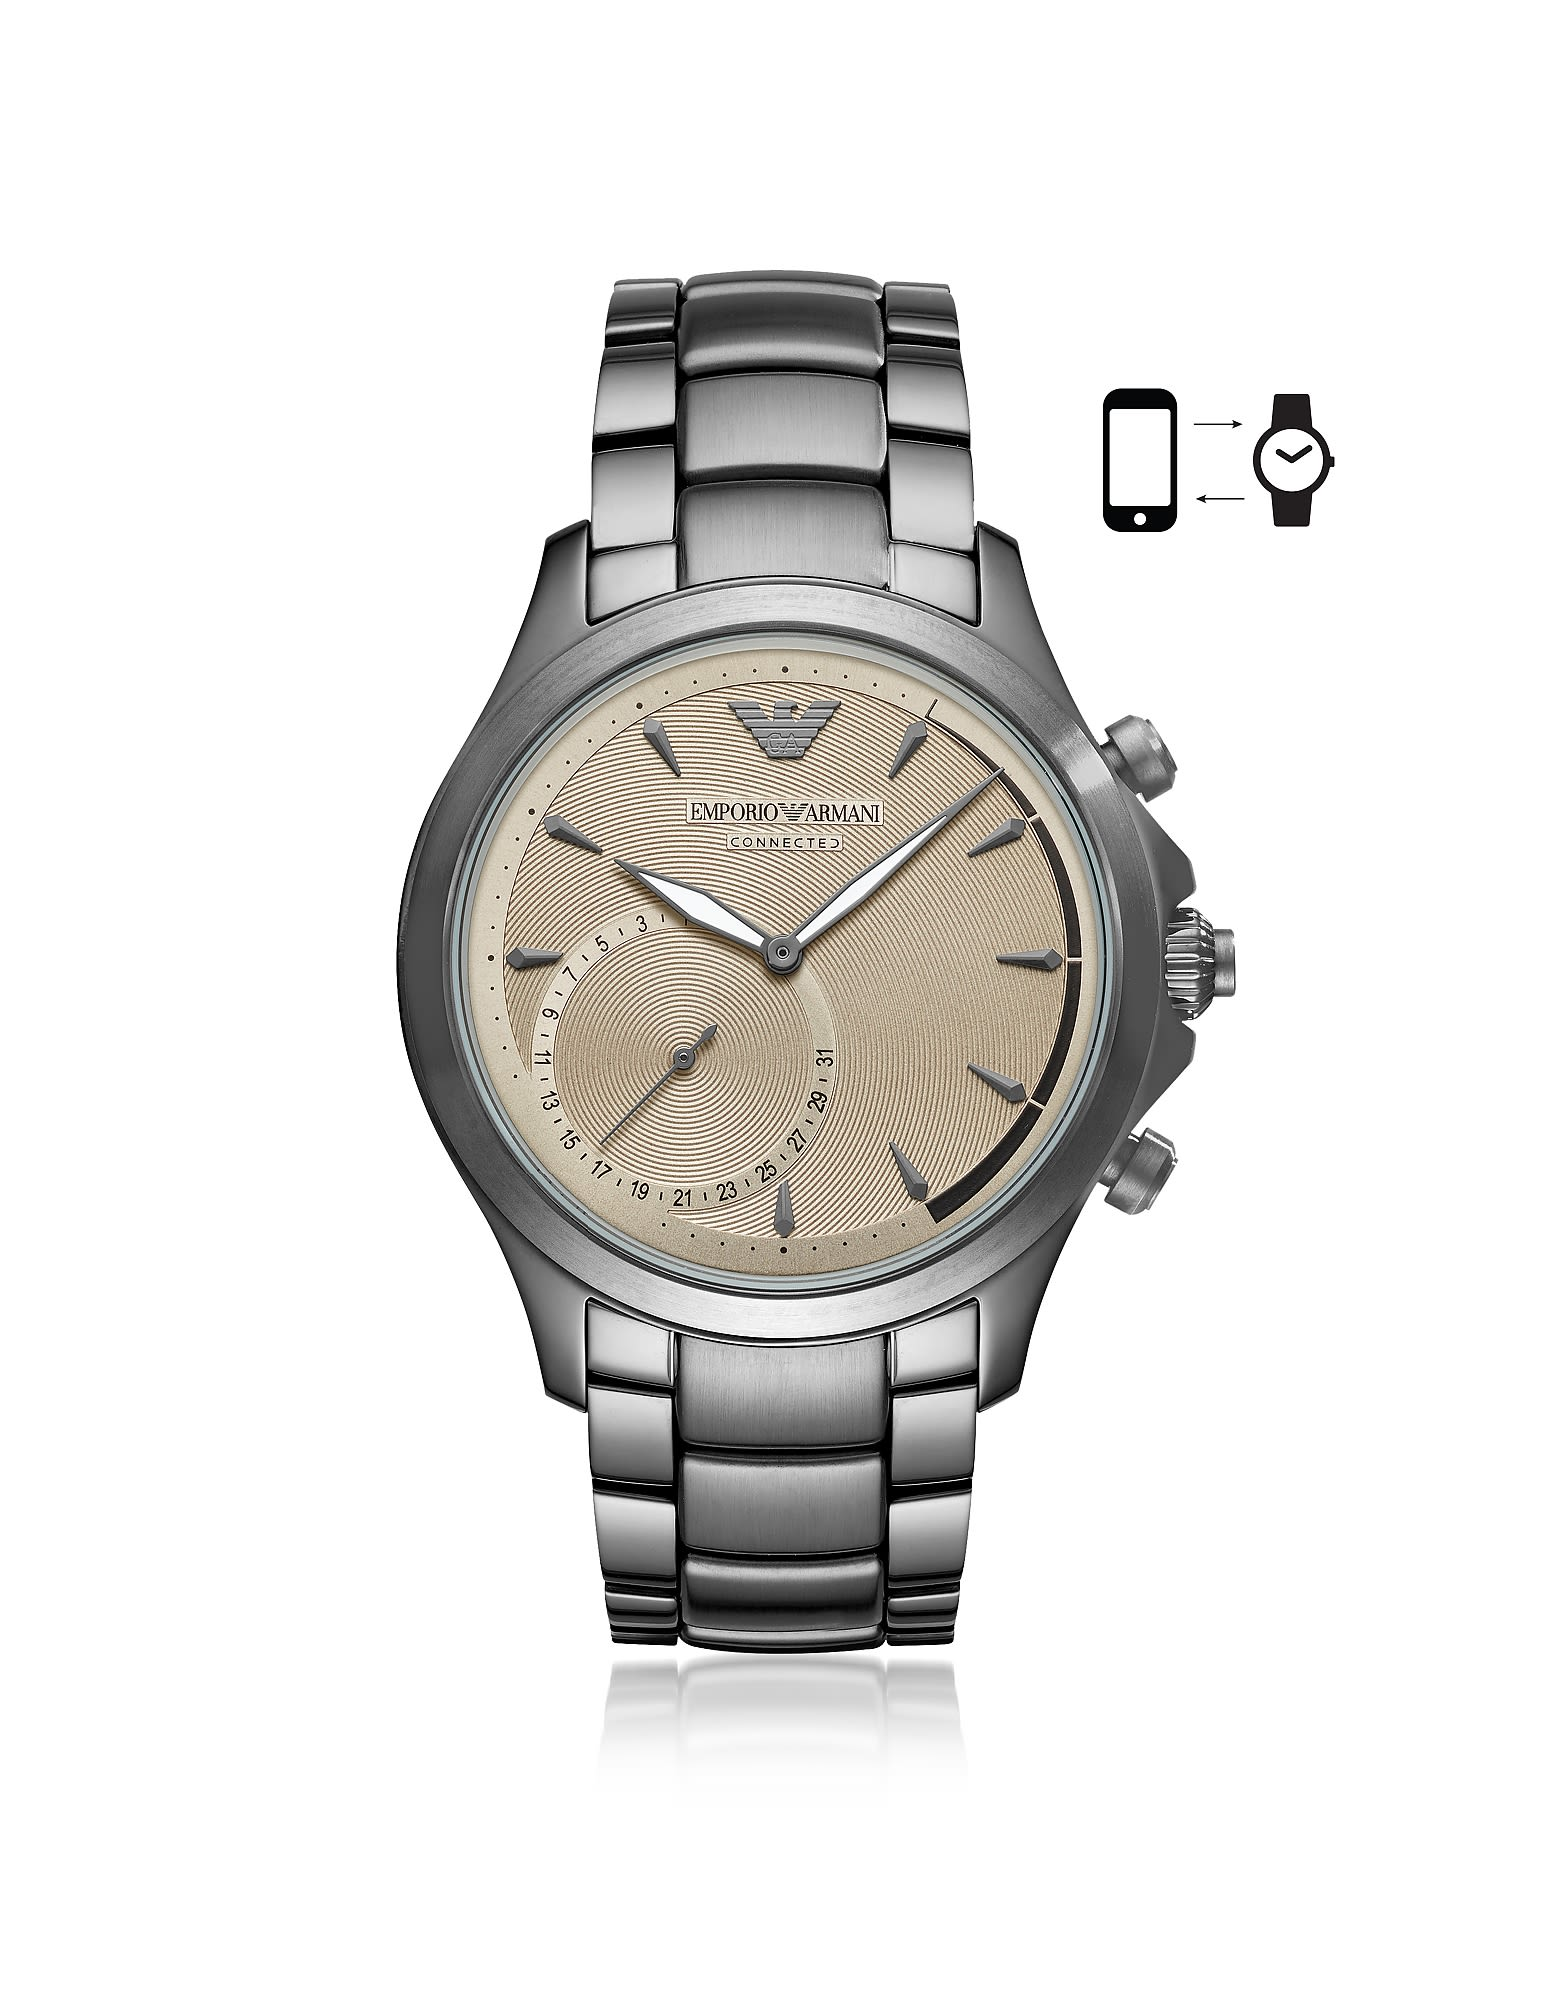 Emporio Armani Emporio Armani Connected Men's Hybrid Smartwatch thumbnail